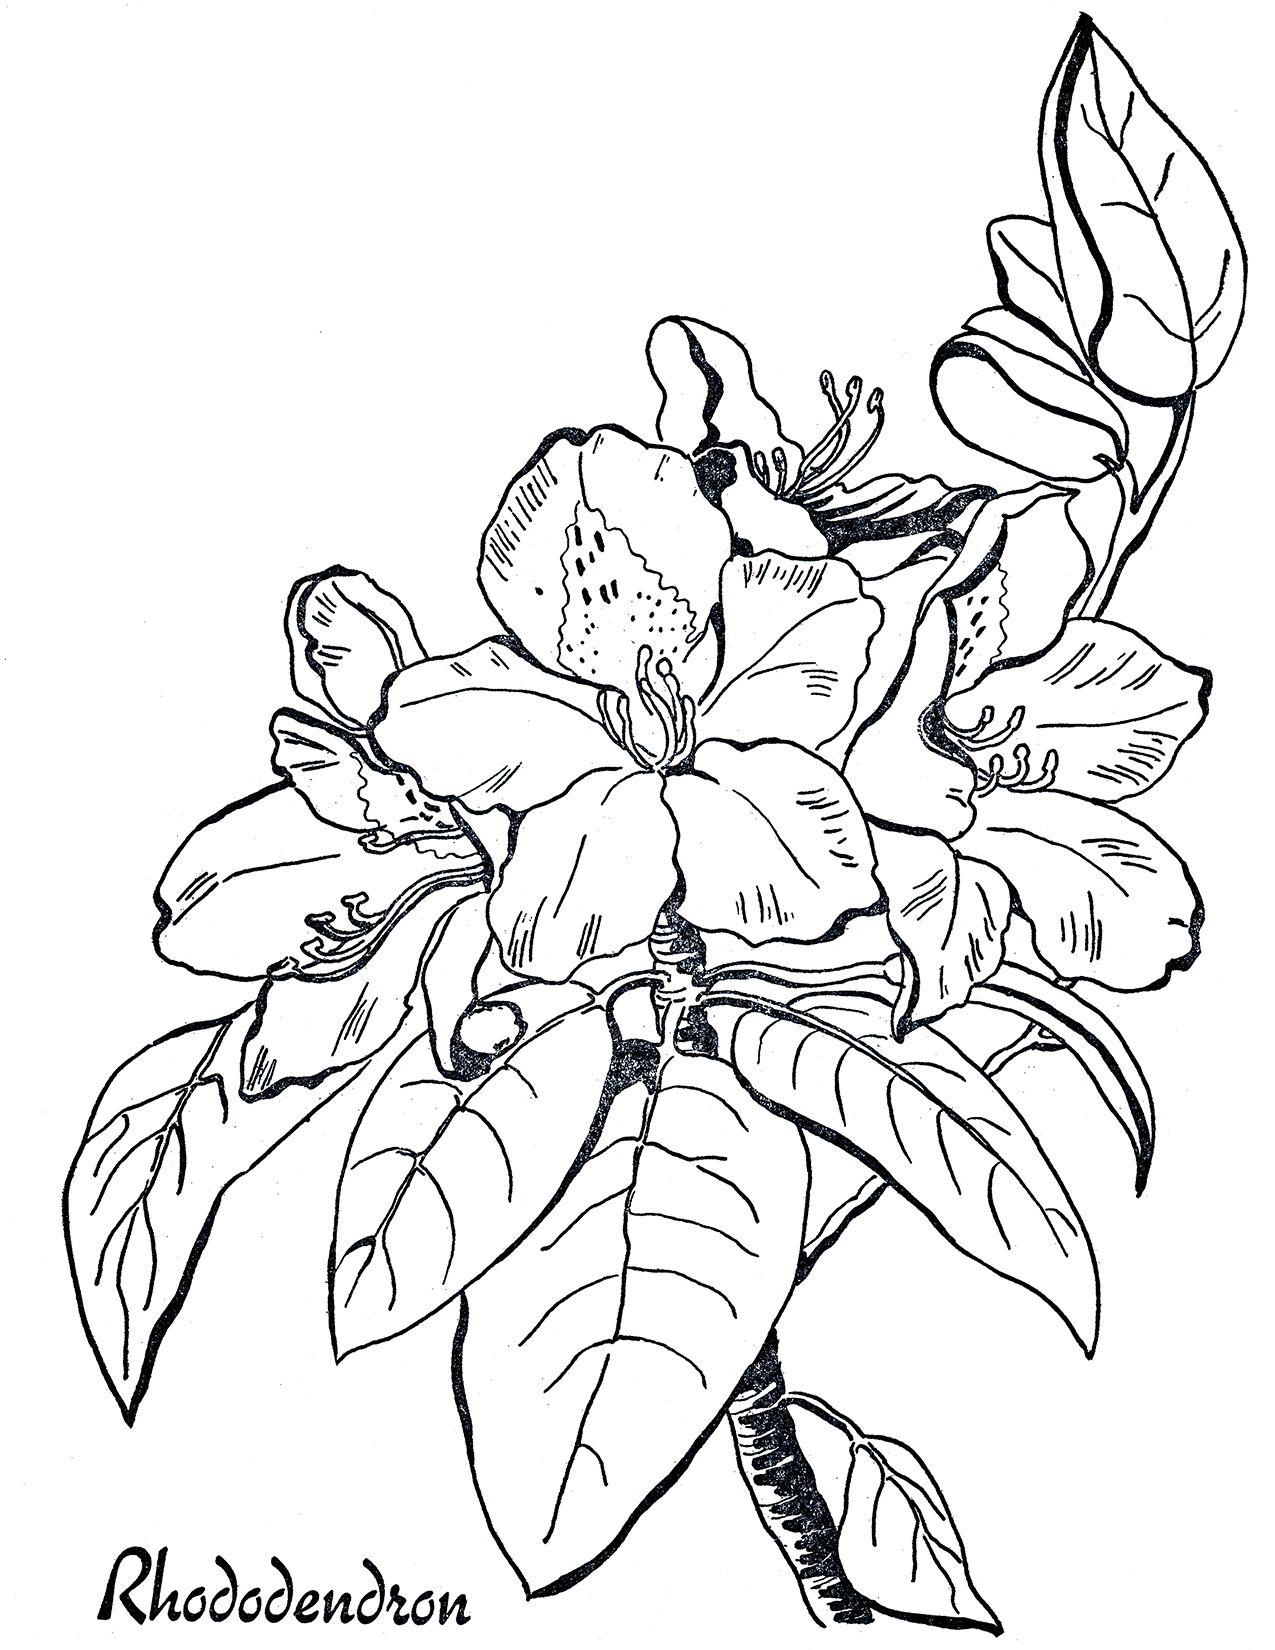 Rhododendron Line Art - Coloring Page | Dibujo de flores, Dibujos de ...